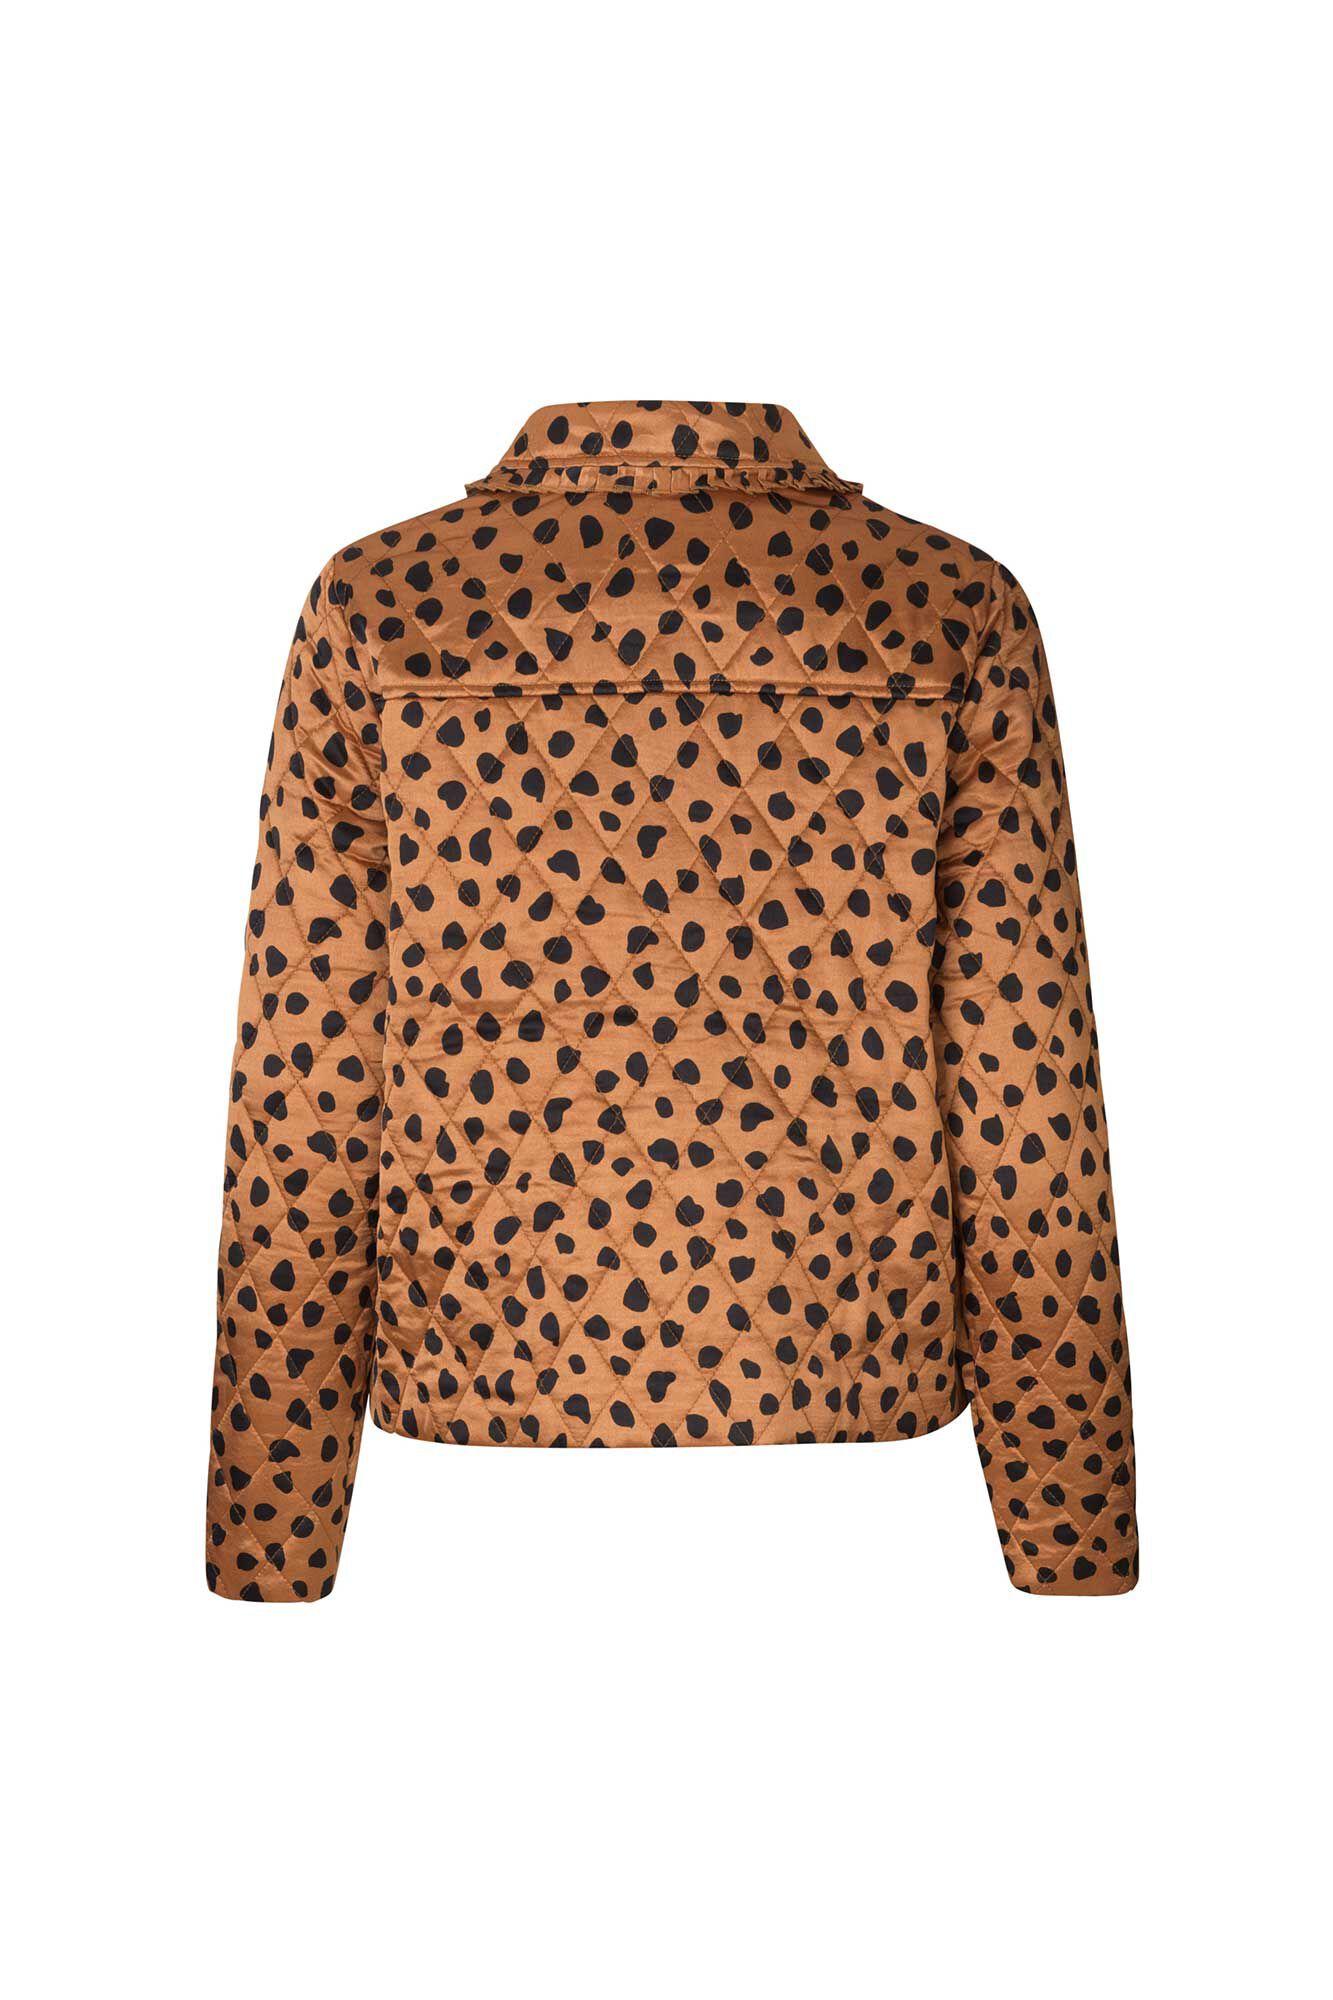 De-lily jacket aop 8038